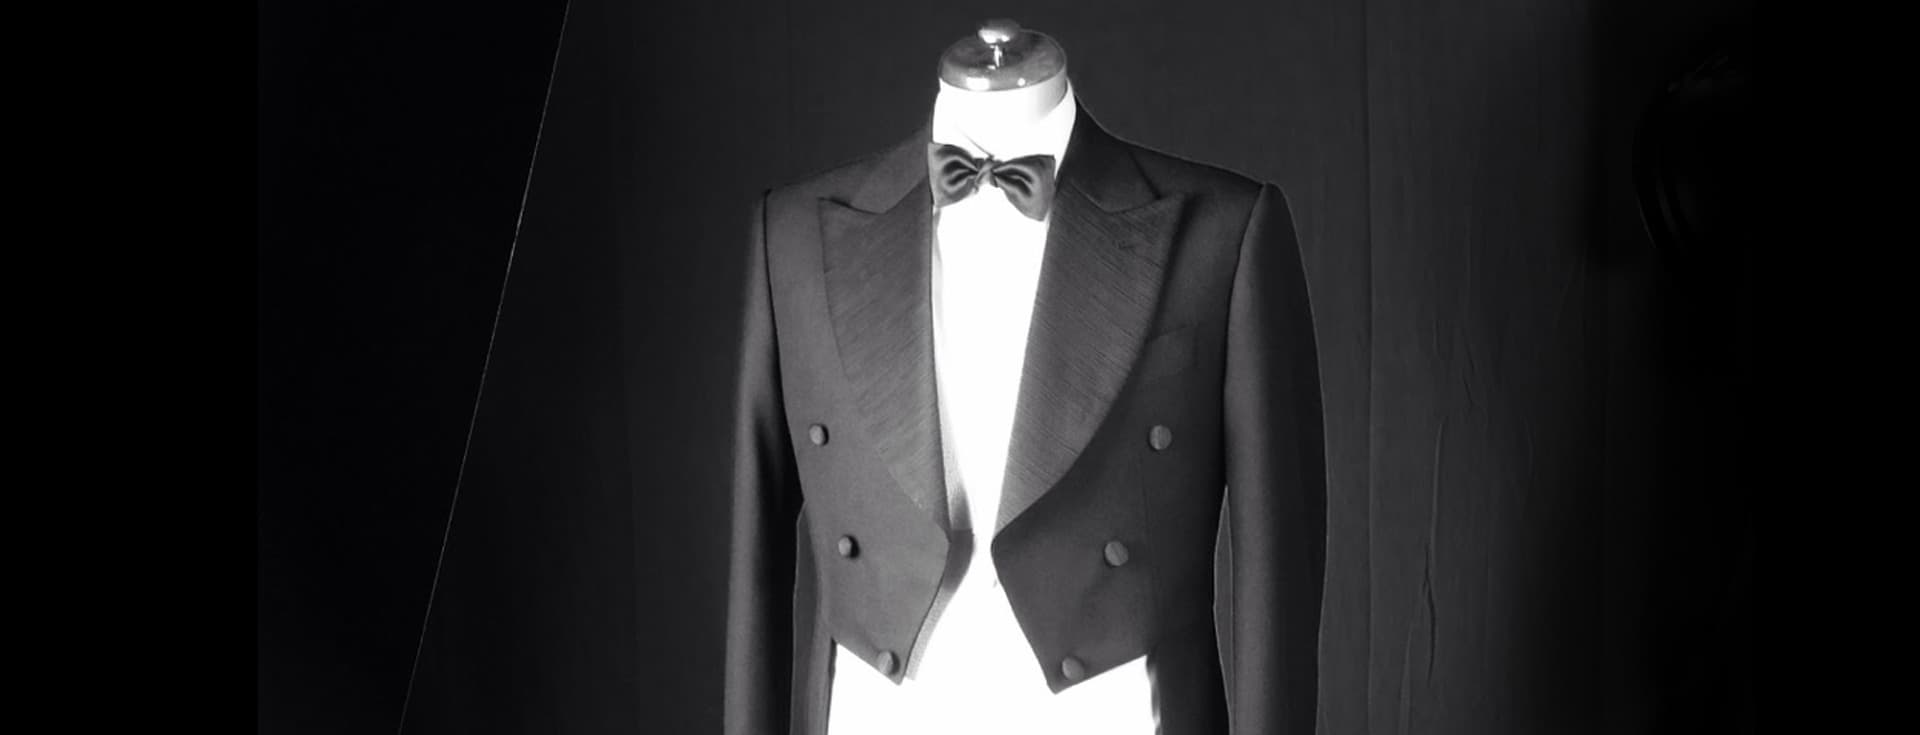 tailor made mens suit melbourne